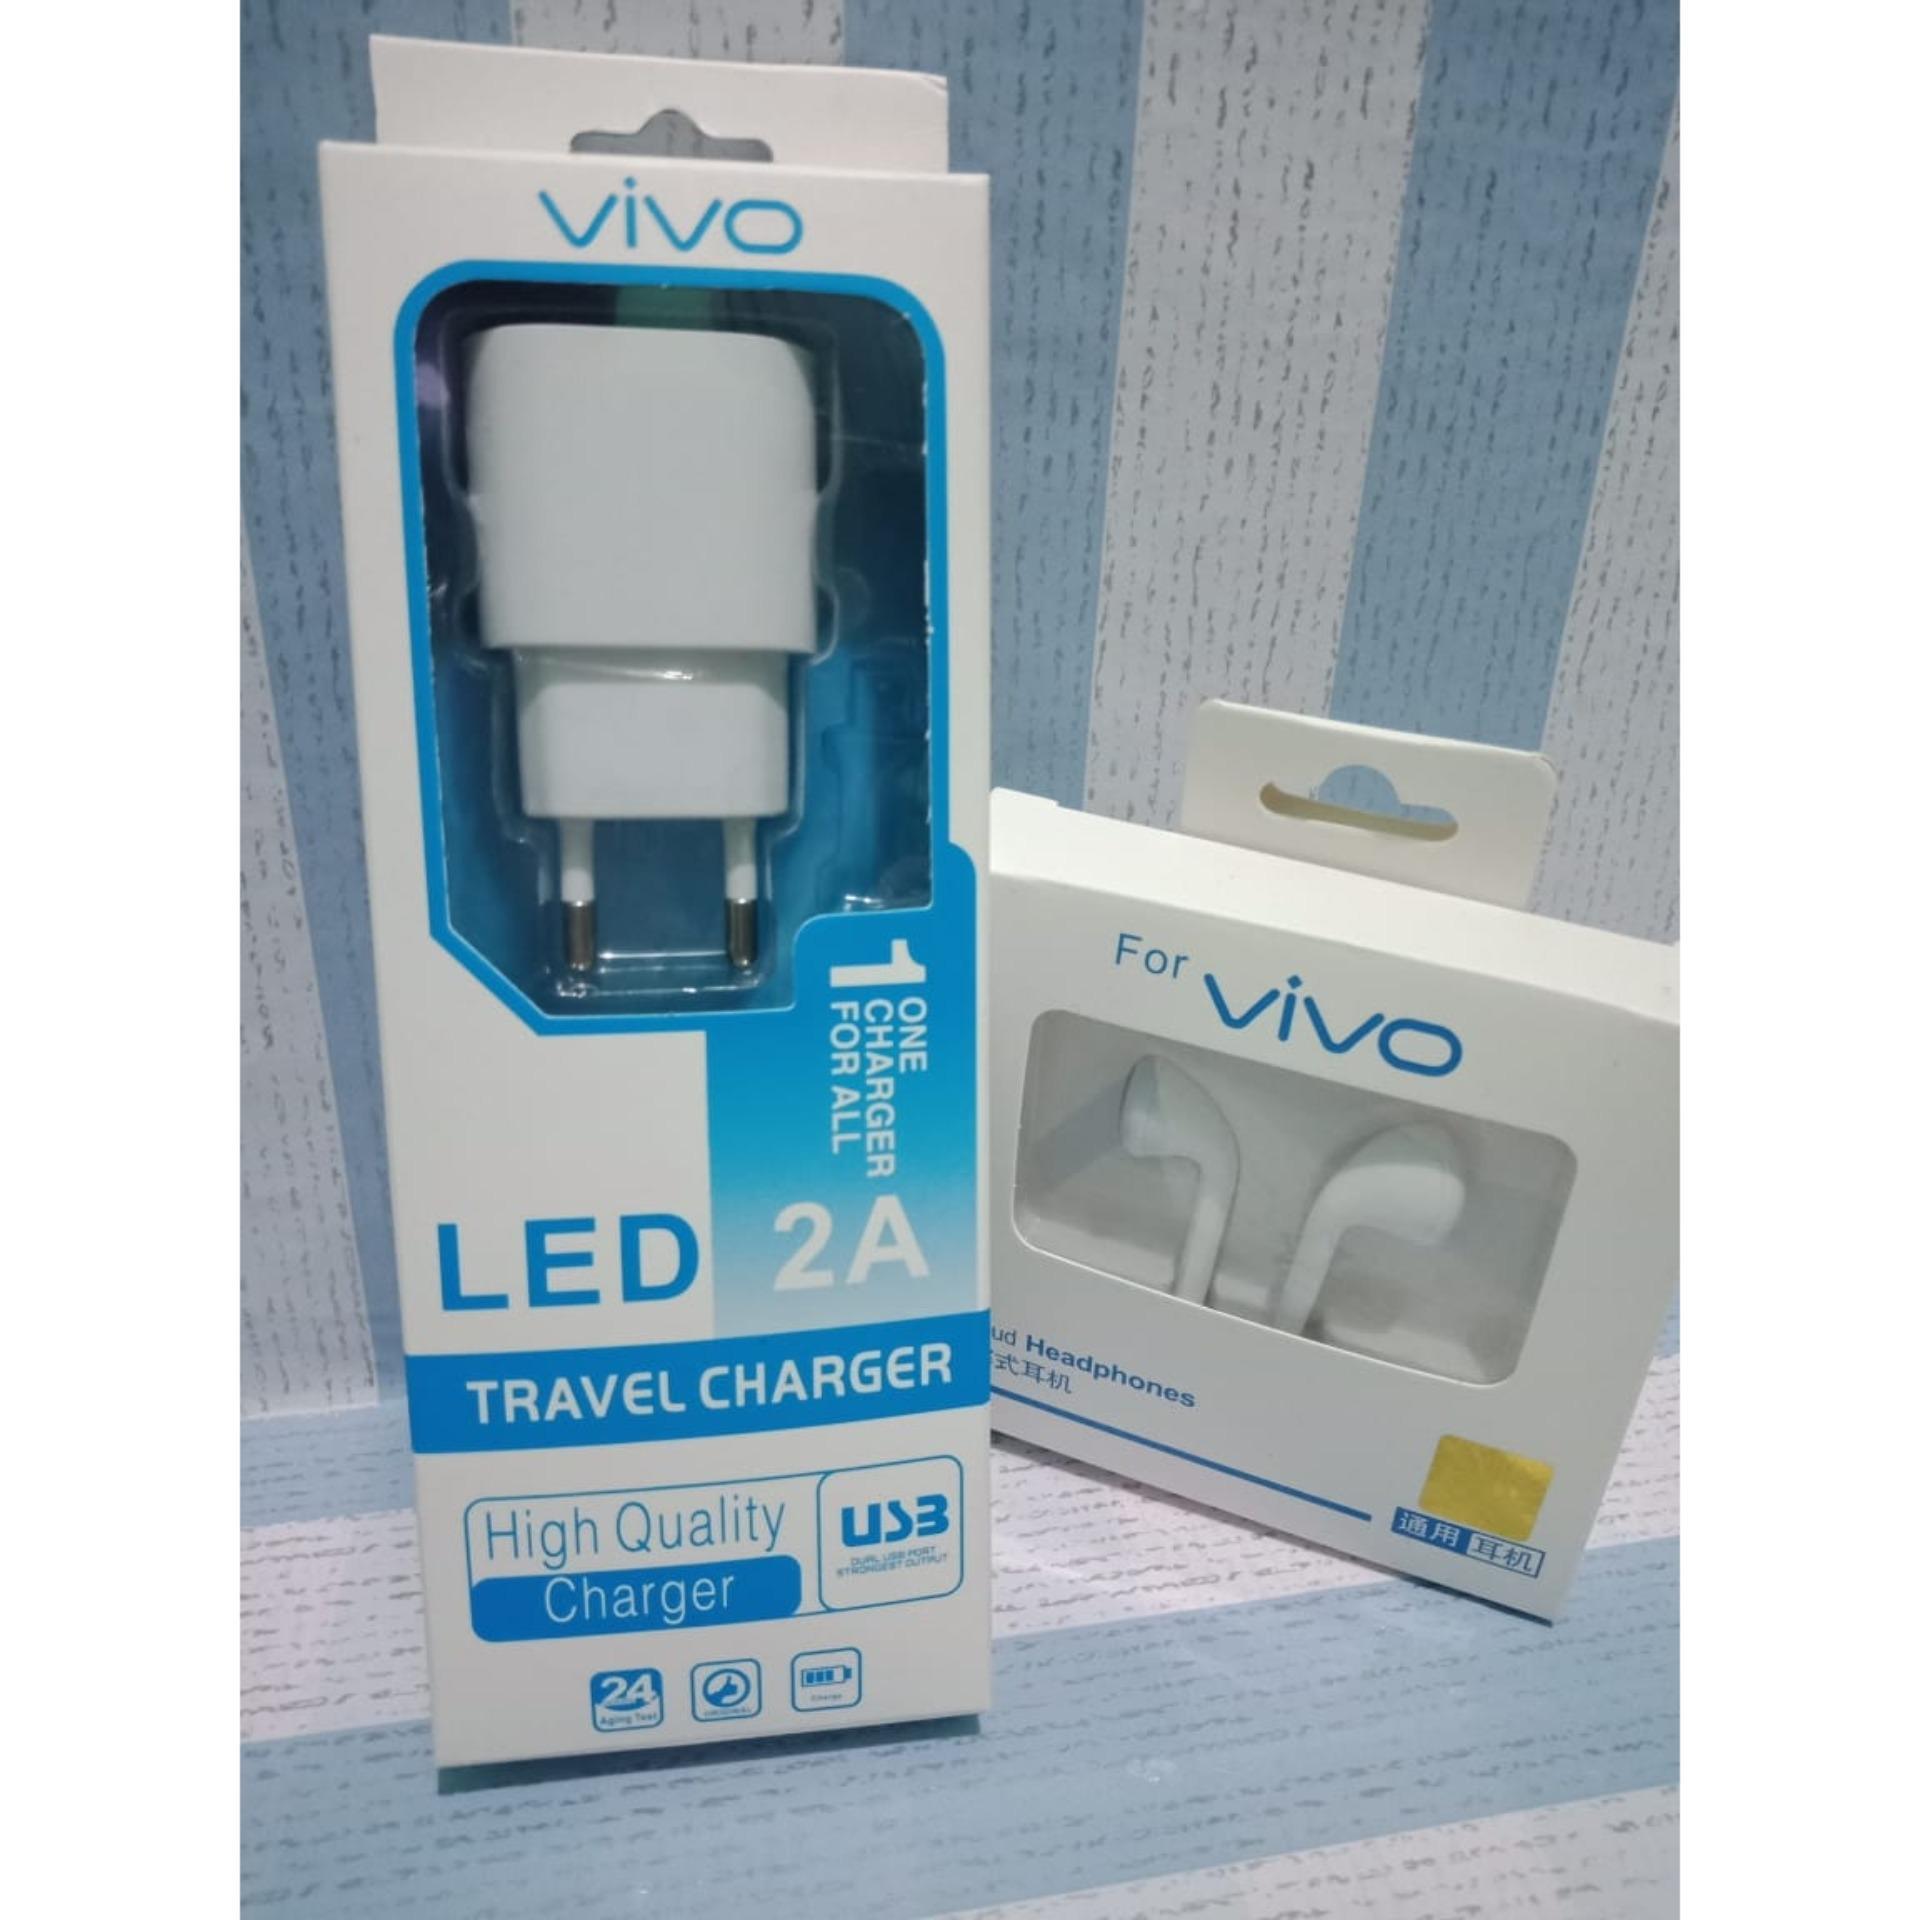 Terbaru Casan Vivo LED Cas Vivo Carger Vivo Charger Vivo Gratis Headset Vivo Hedseat Vivo - LLS89